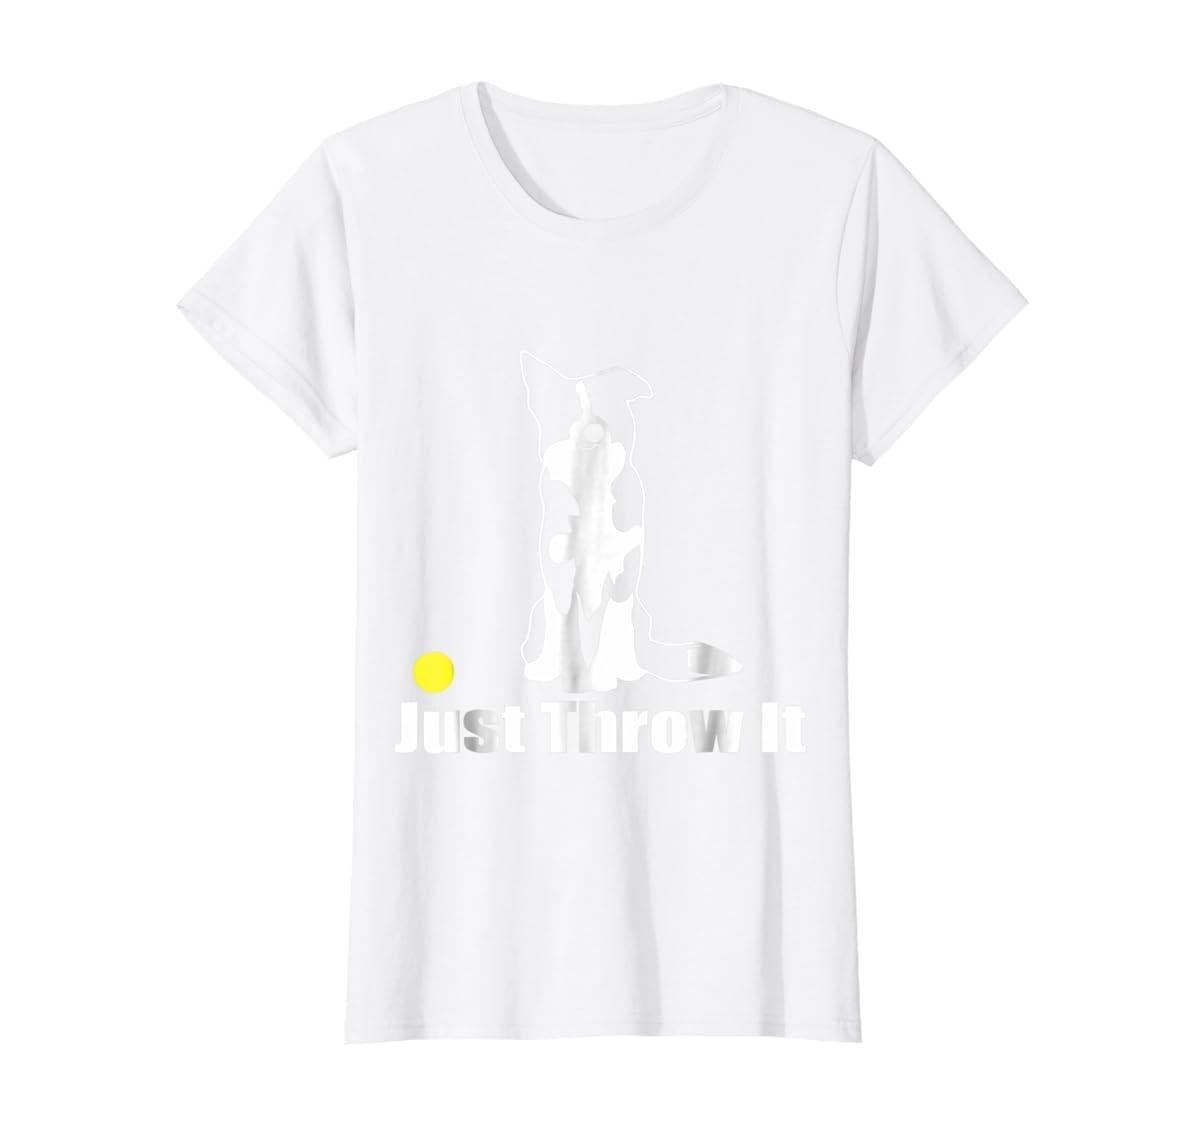 JUST THROW IT | NickerStickers Border Collie T-Shirt-Women's T-Shirt-White